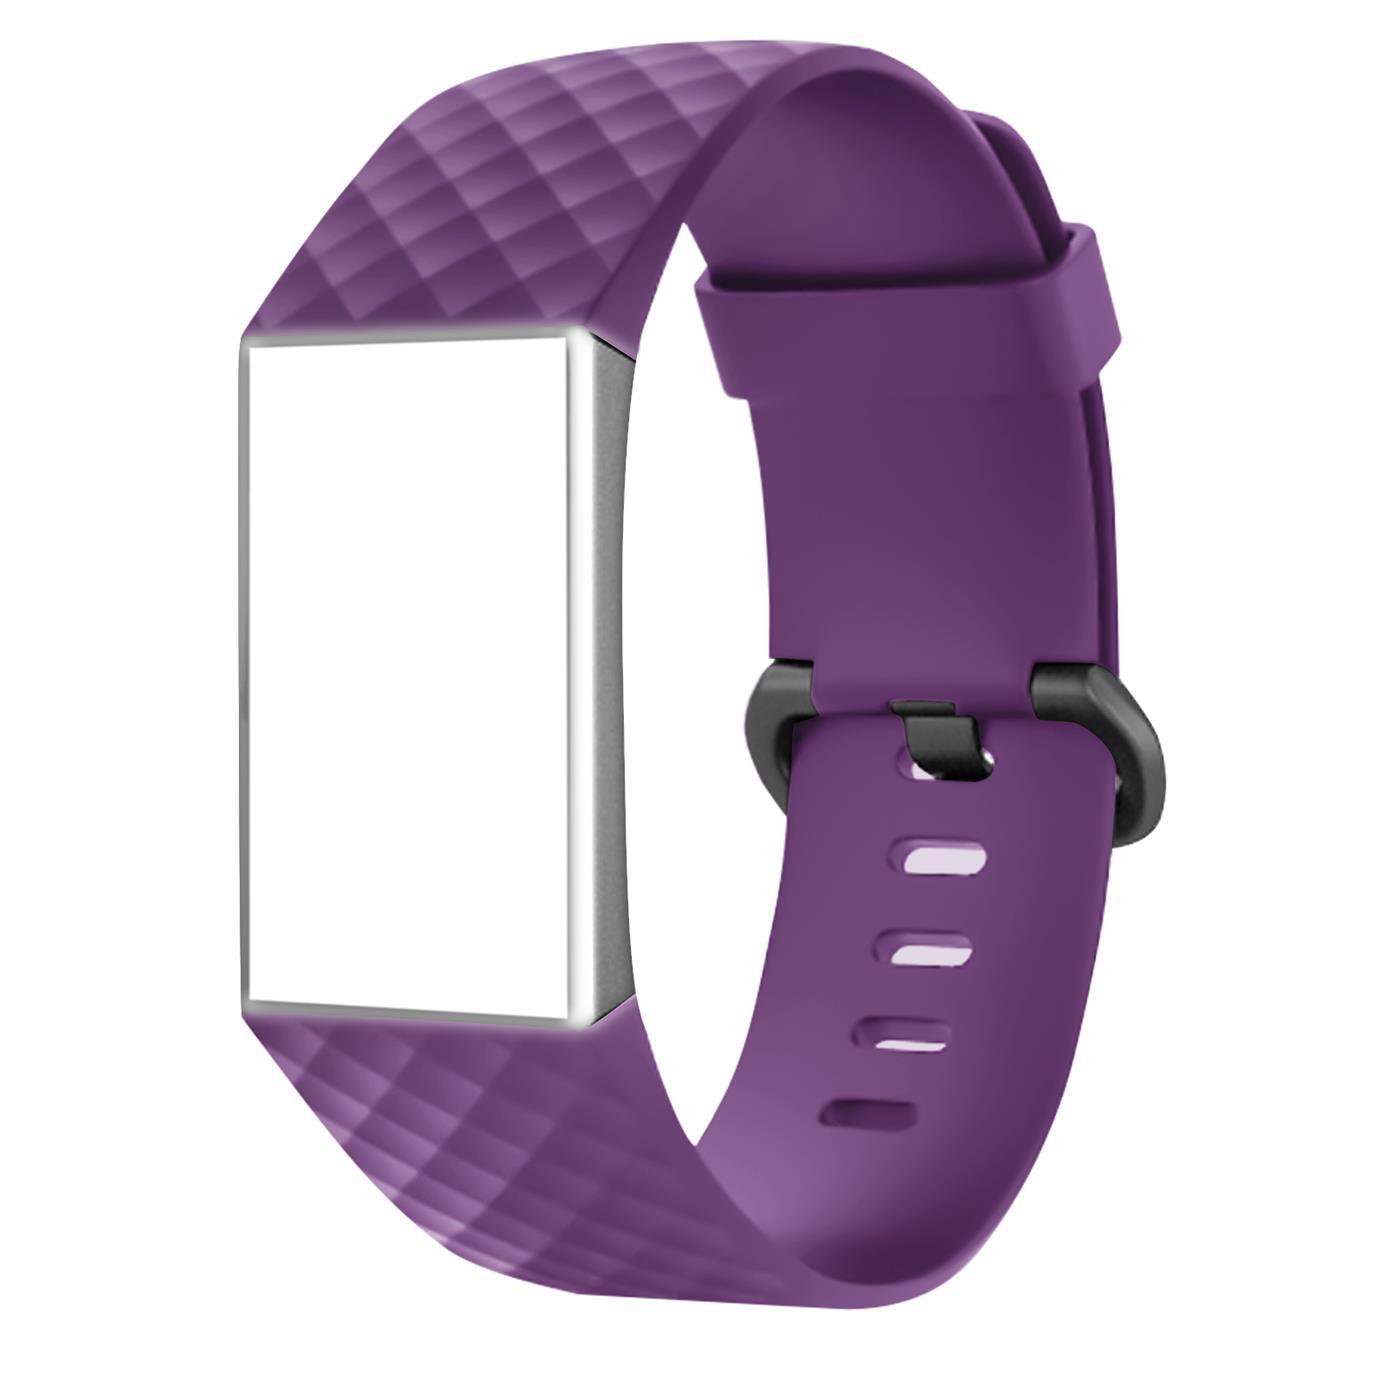 Fitbit-Groesse-S-oder-L-Ersatz-Silikon-Armband-Uhren-Sport-Band-Fitness-Tracker Indexbild 20